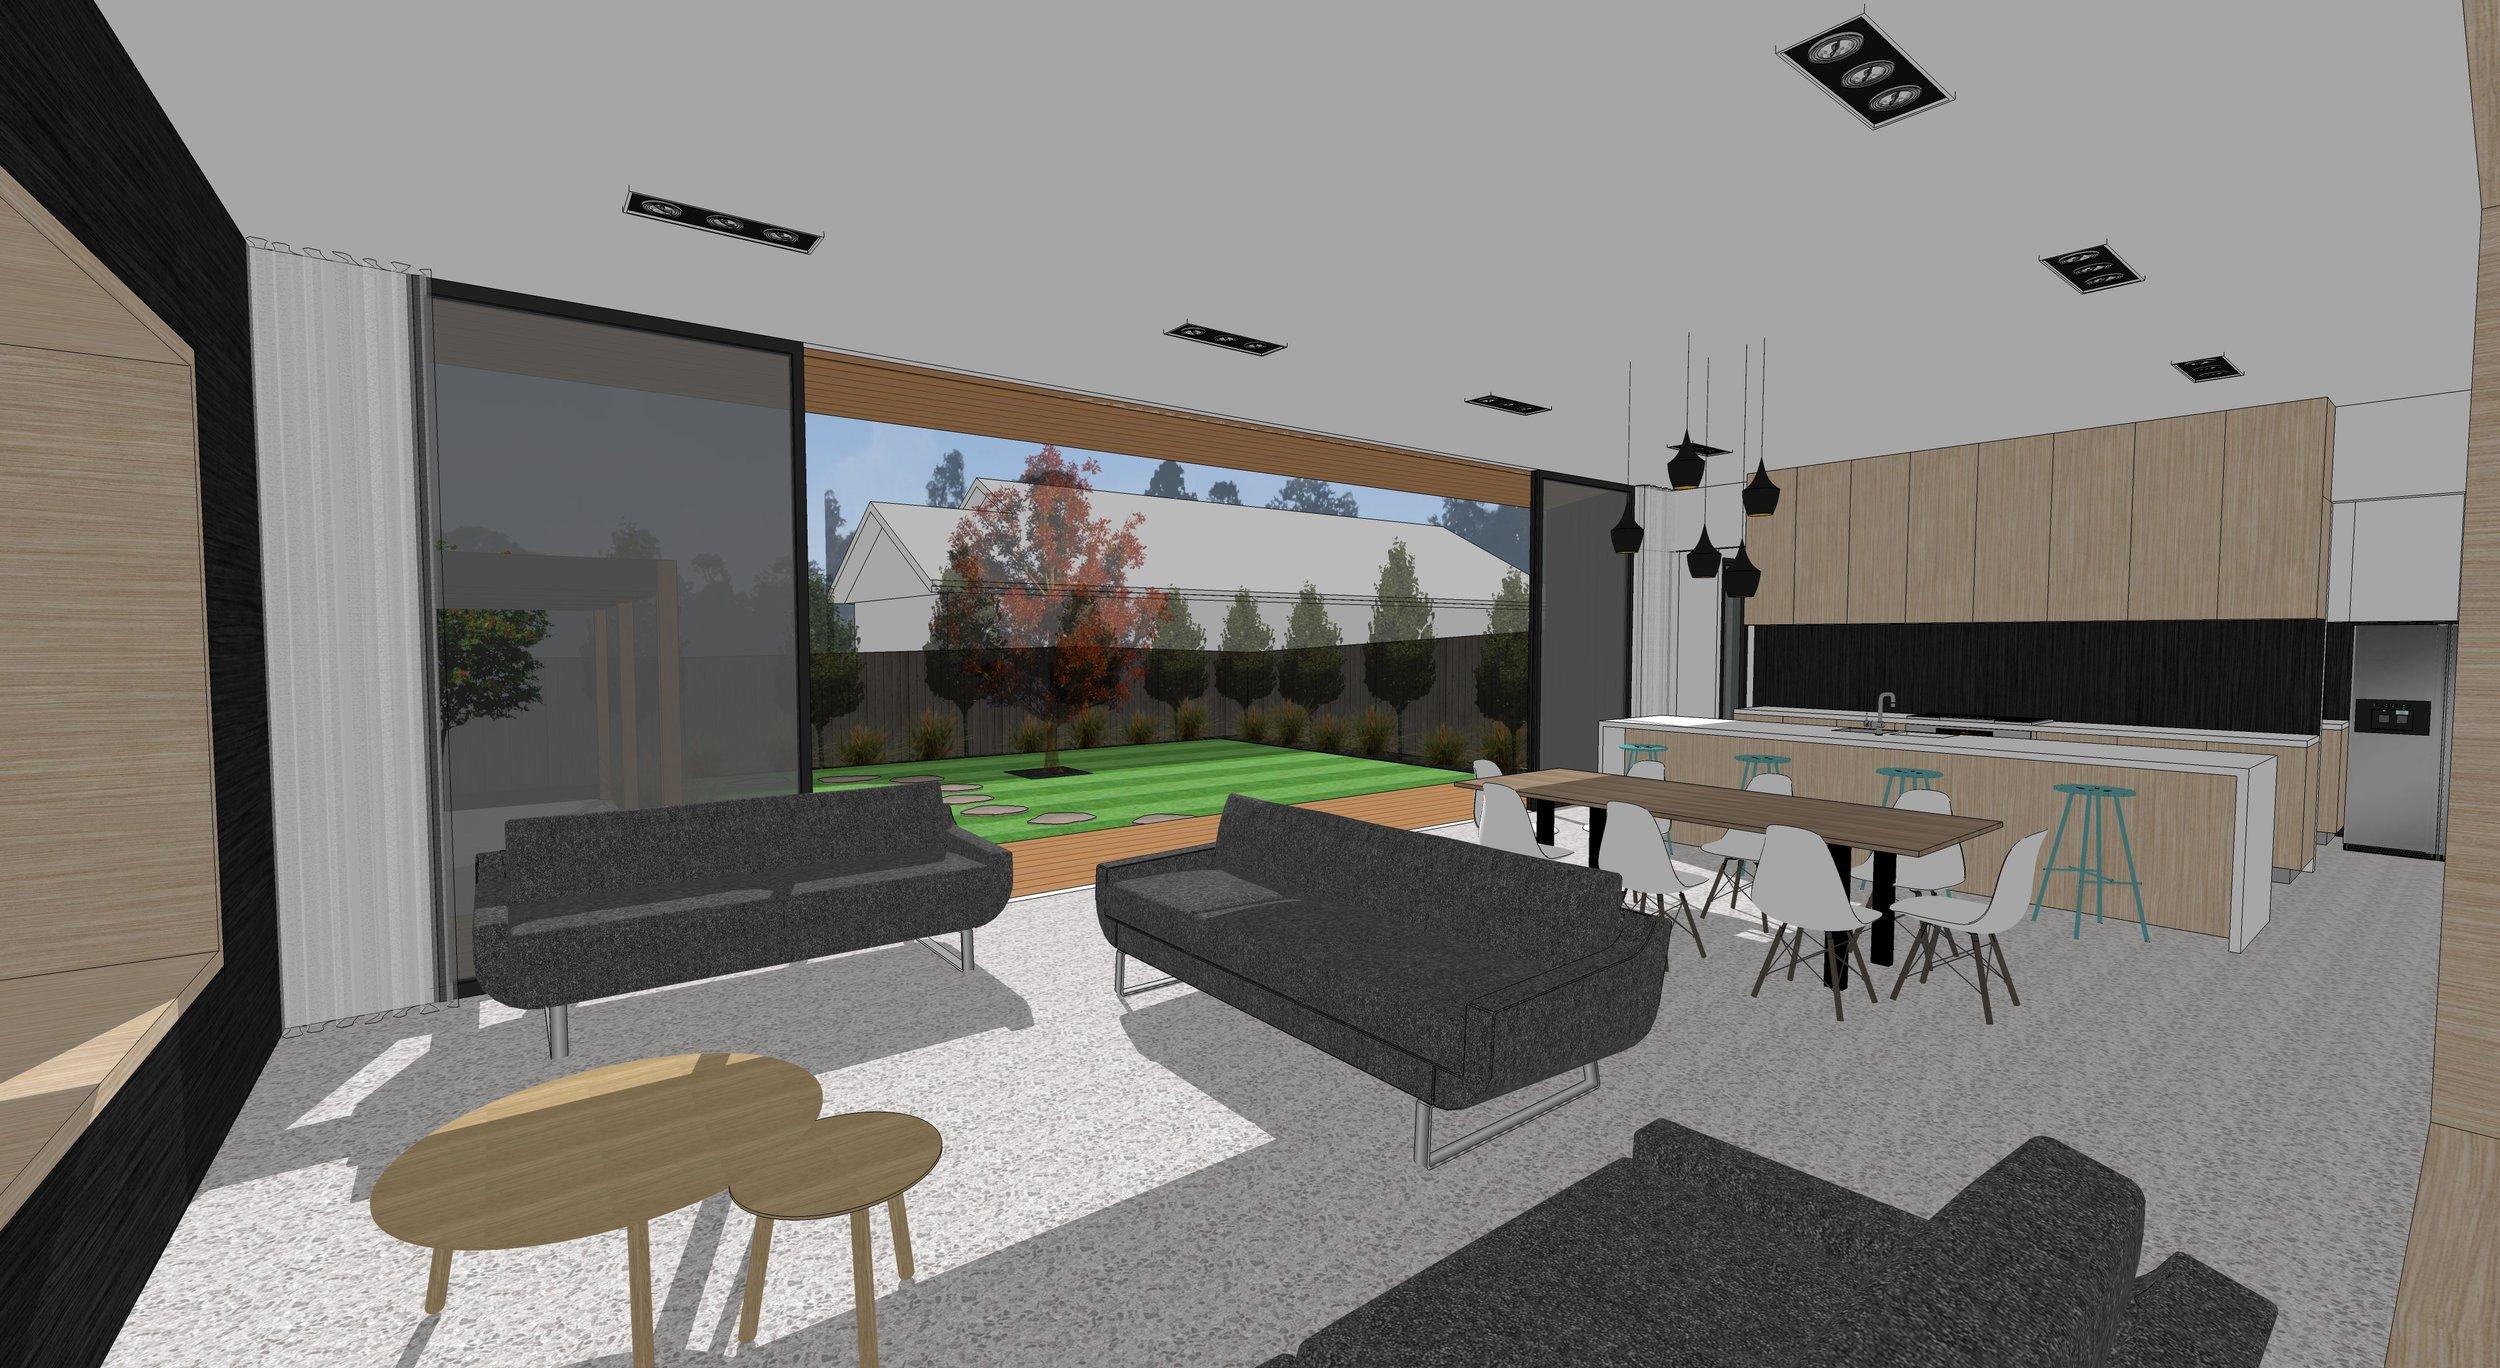 View 03 - (Rev 02) 16 Gertrude Street, Geelong West.jpg